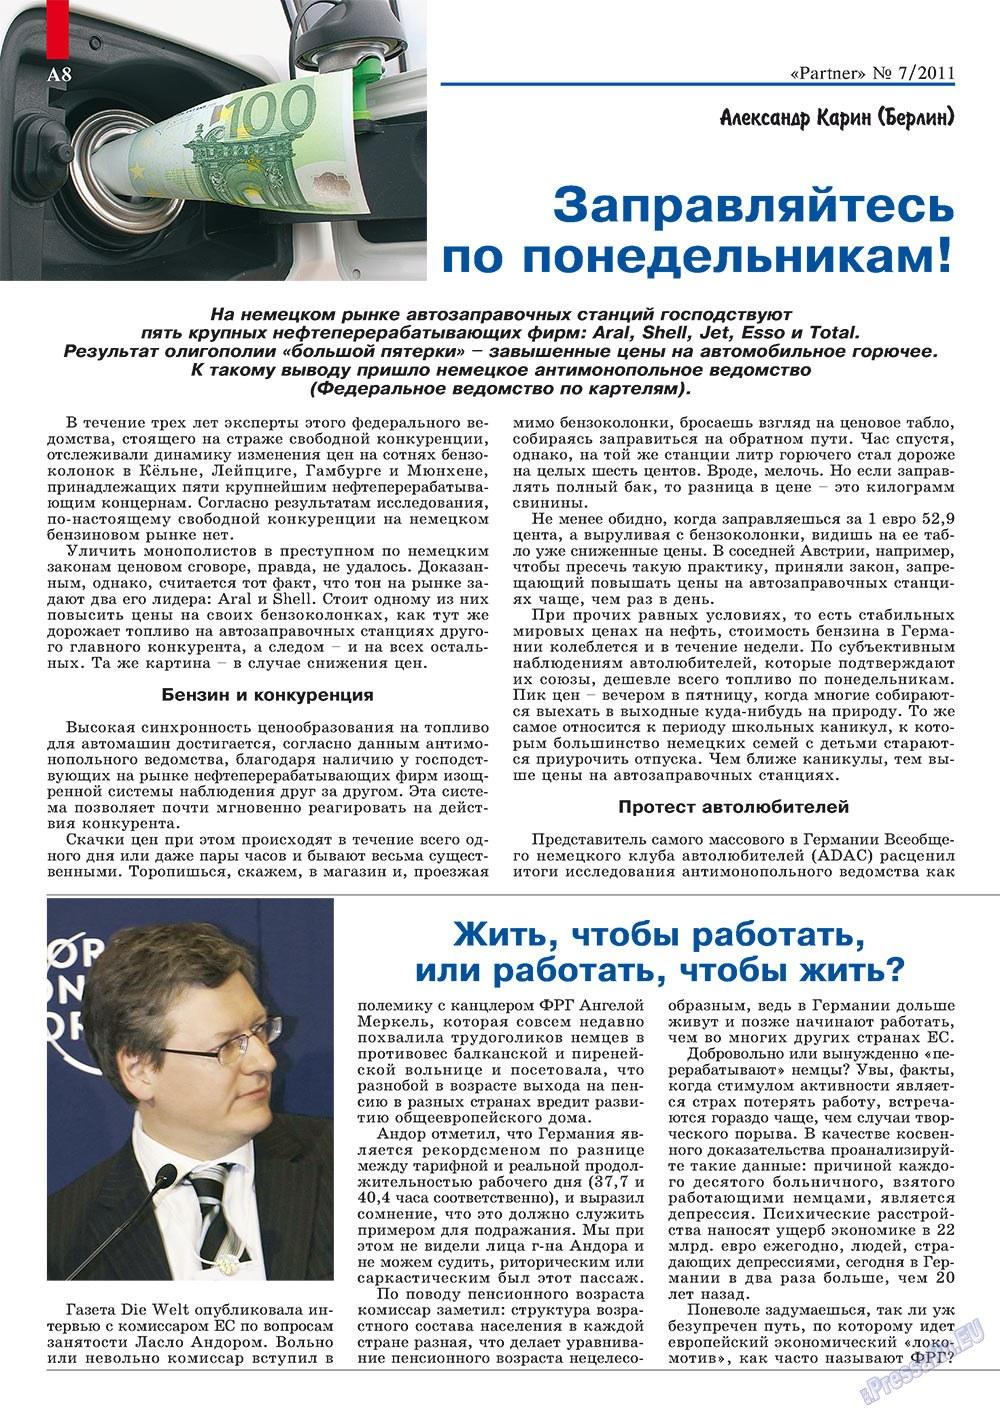 Партнер-север (журнал). 2011 год, номер 7, стр. 8